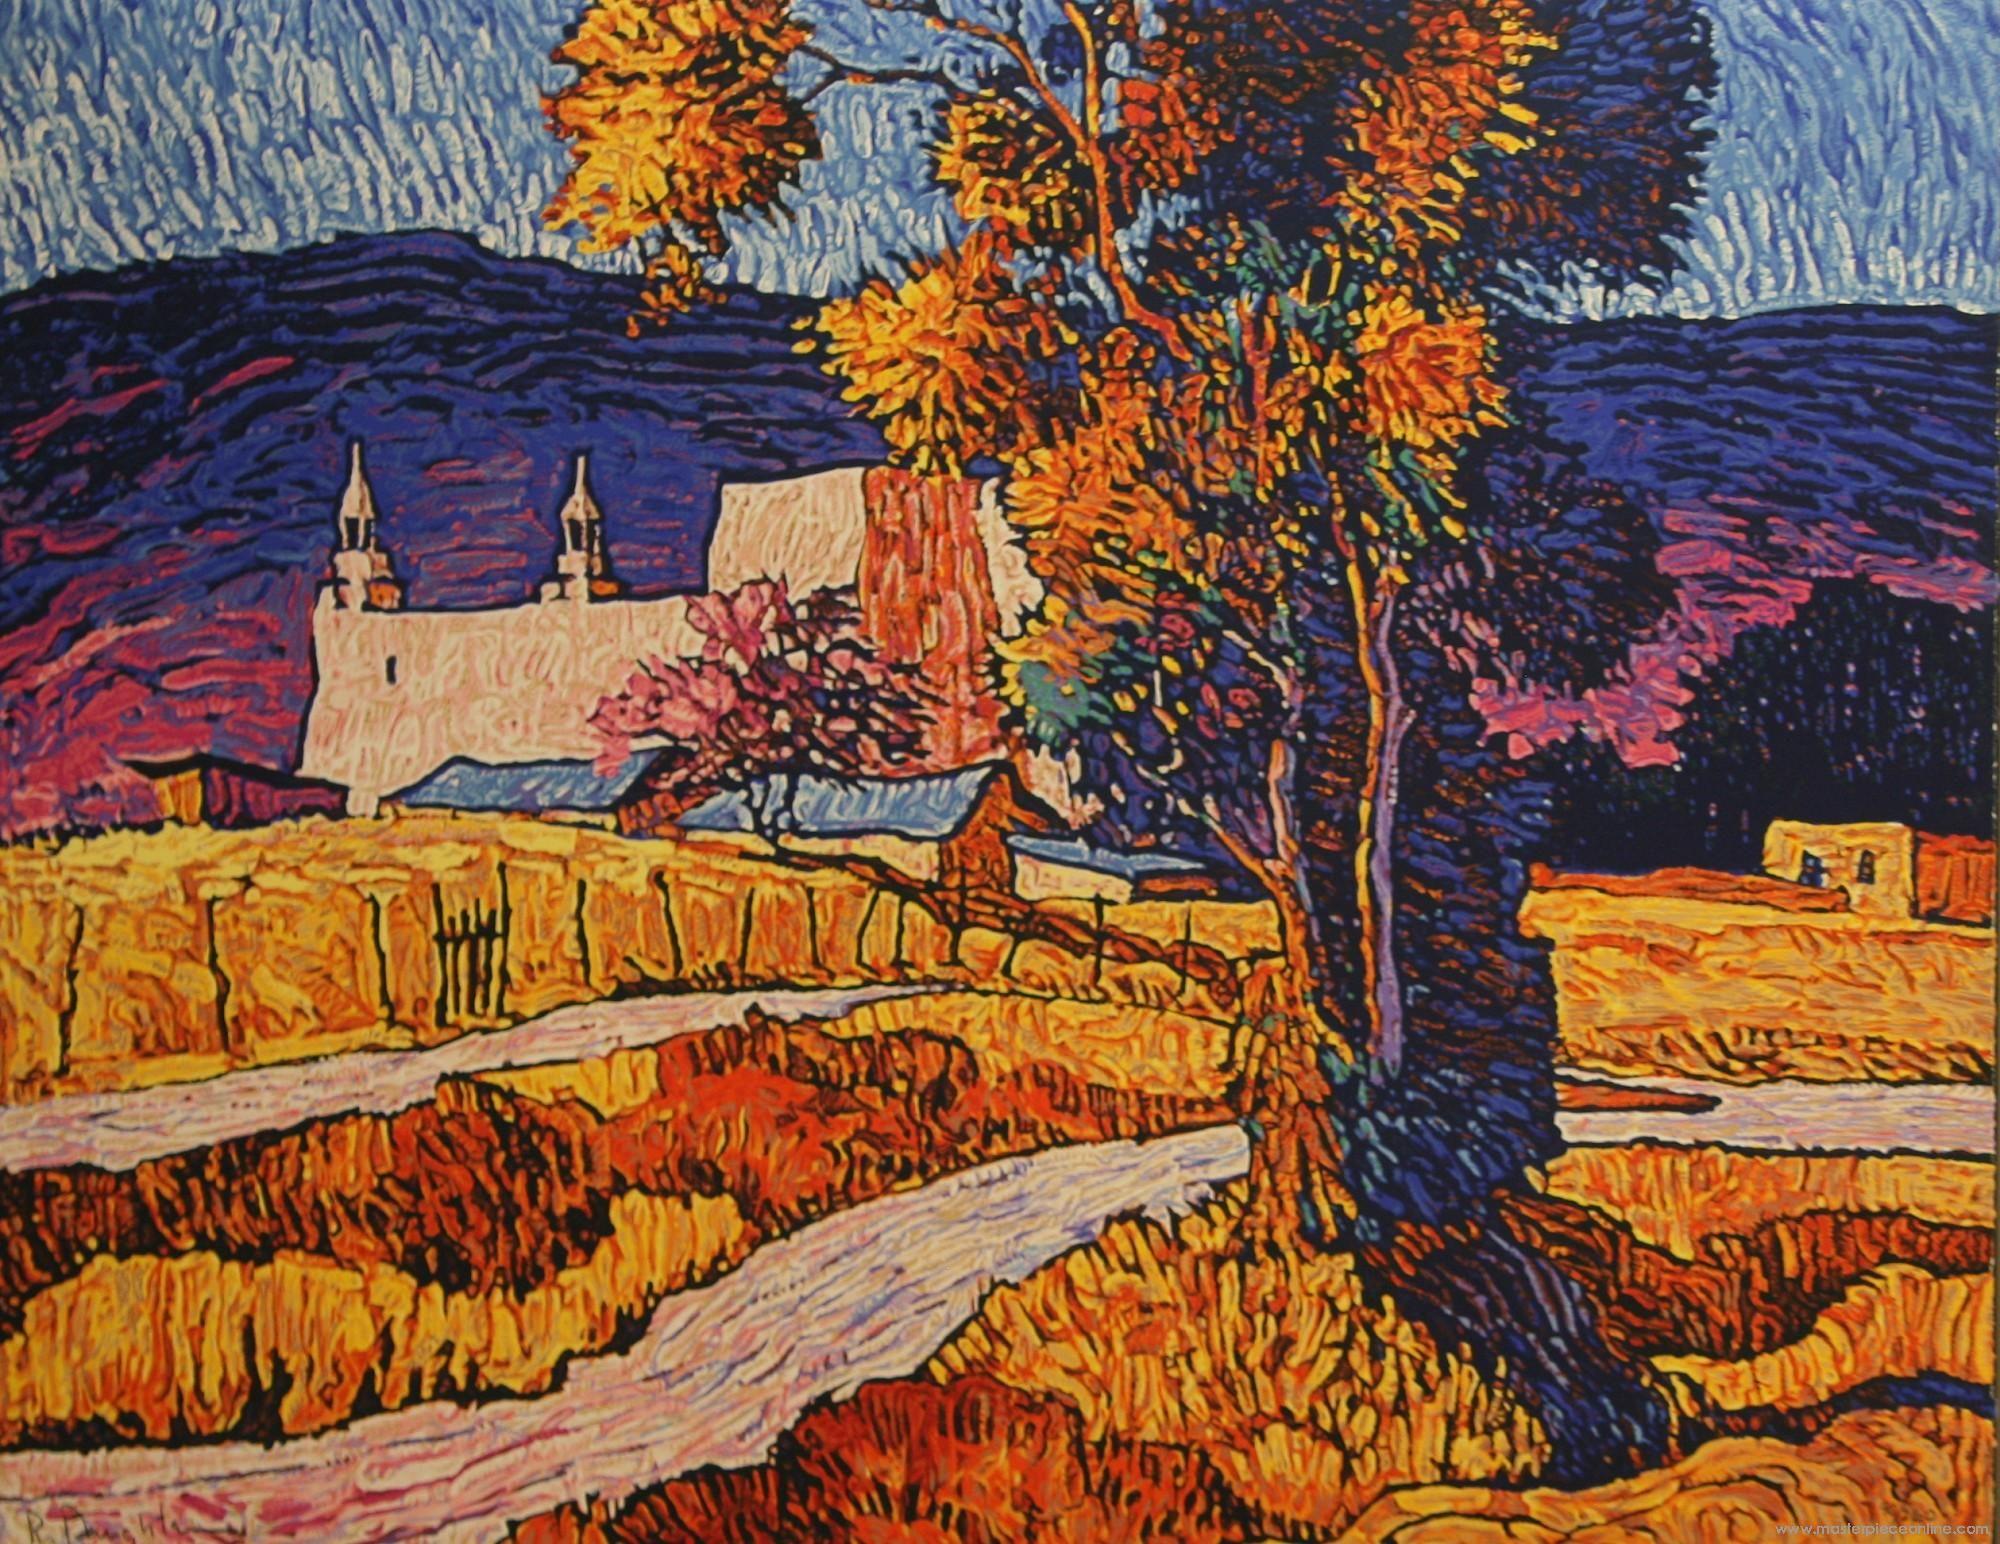 Robert Daughters - Las Trampas II | Art I Like: Landscapes ...